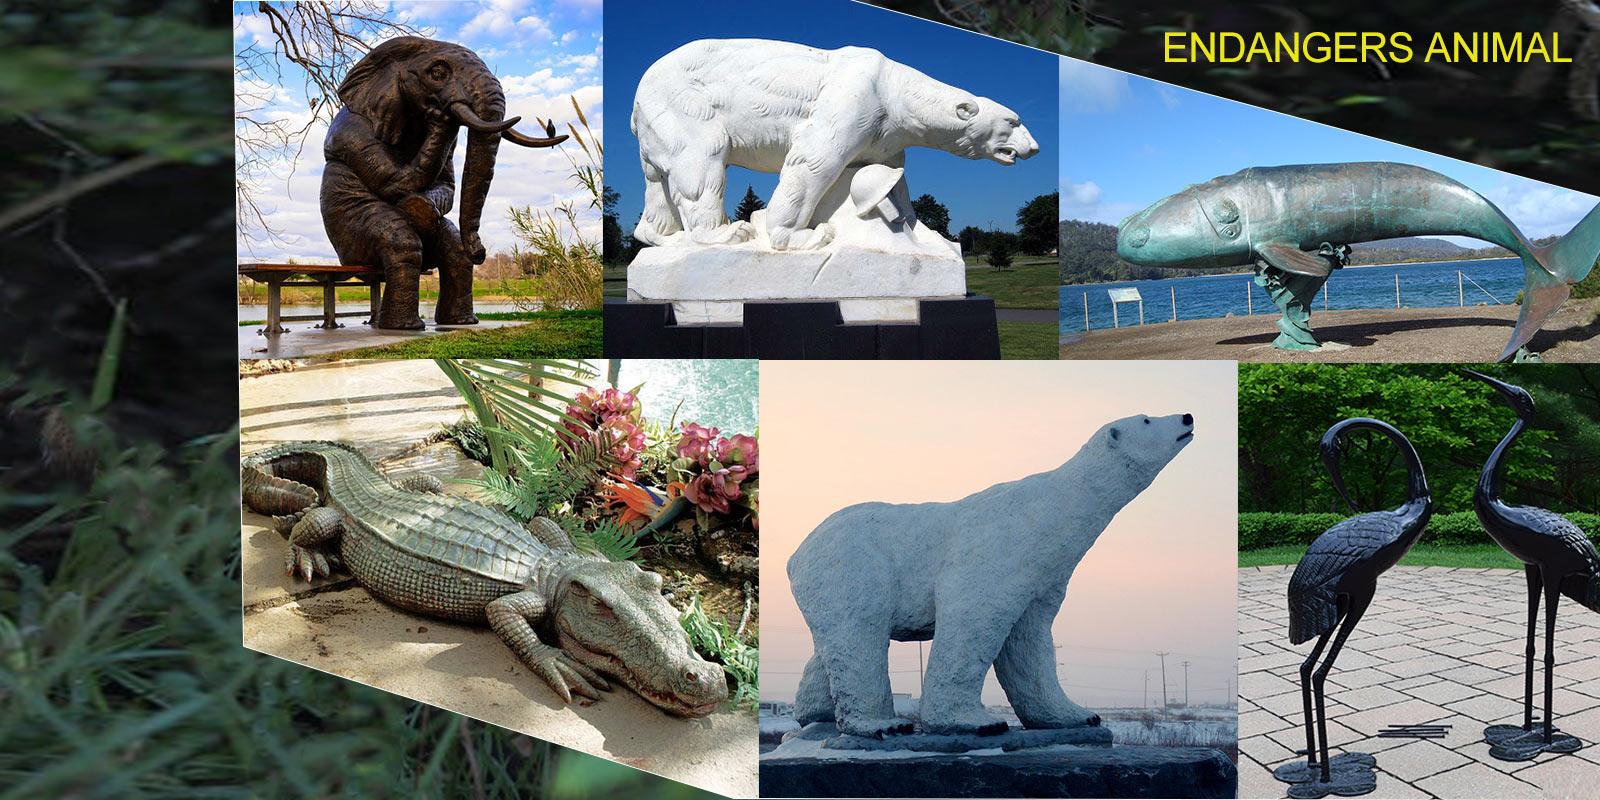 Endangers Animals